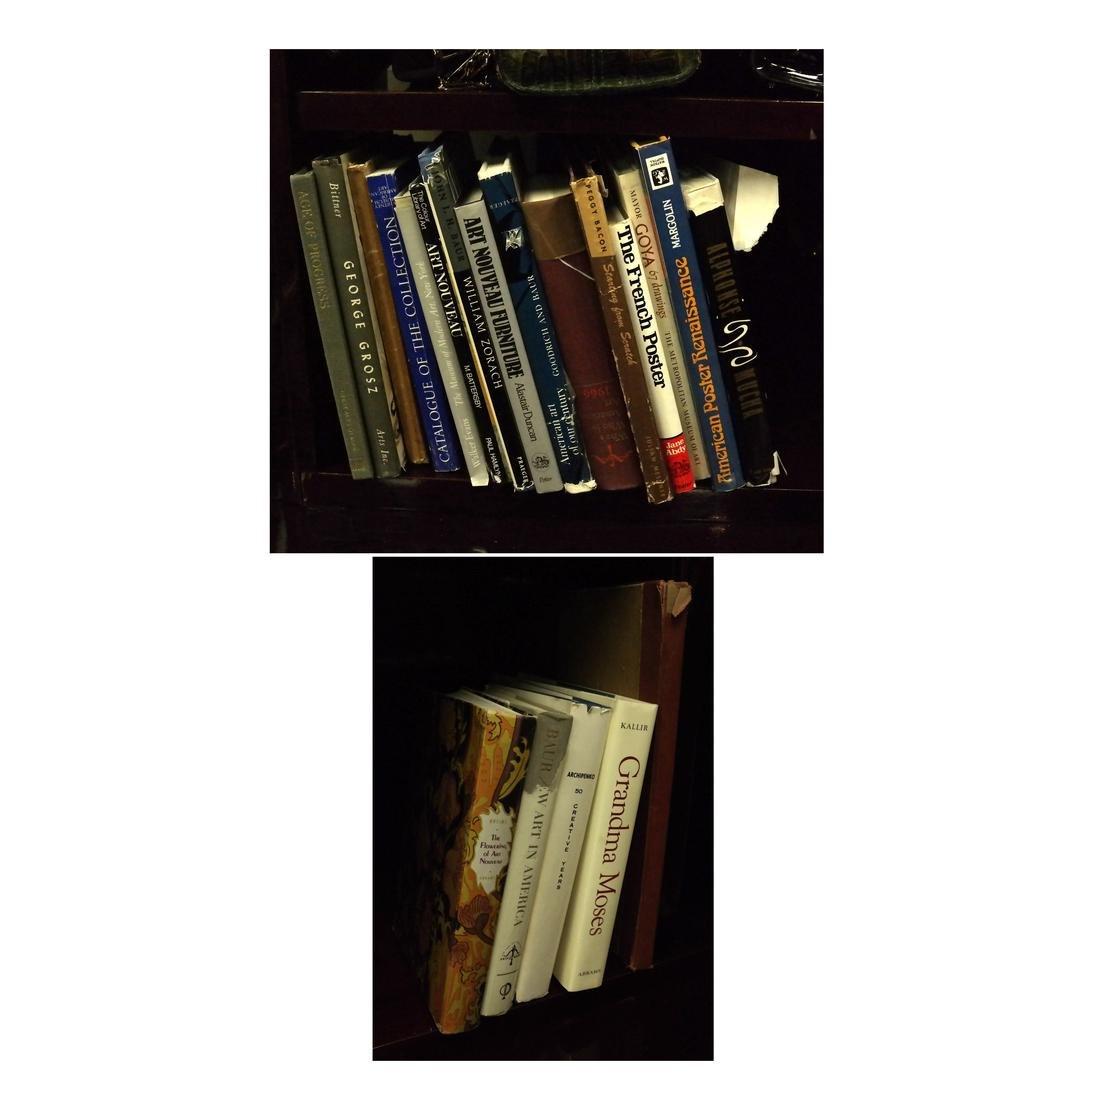 19 Books, American and European Fine Art